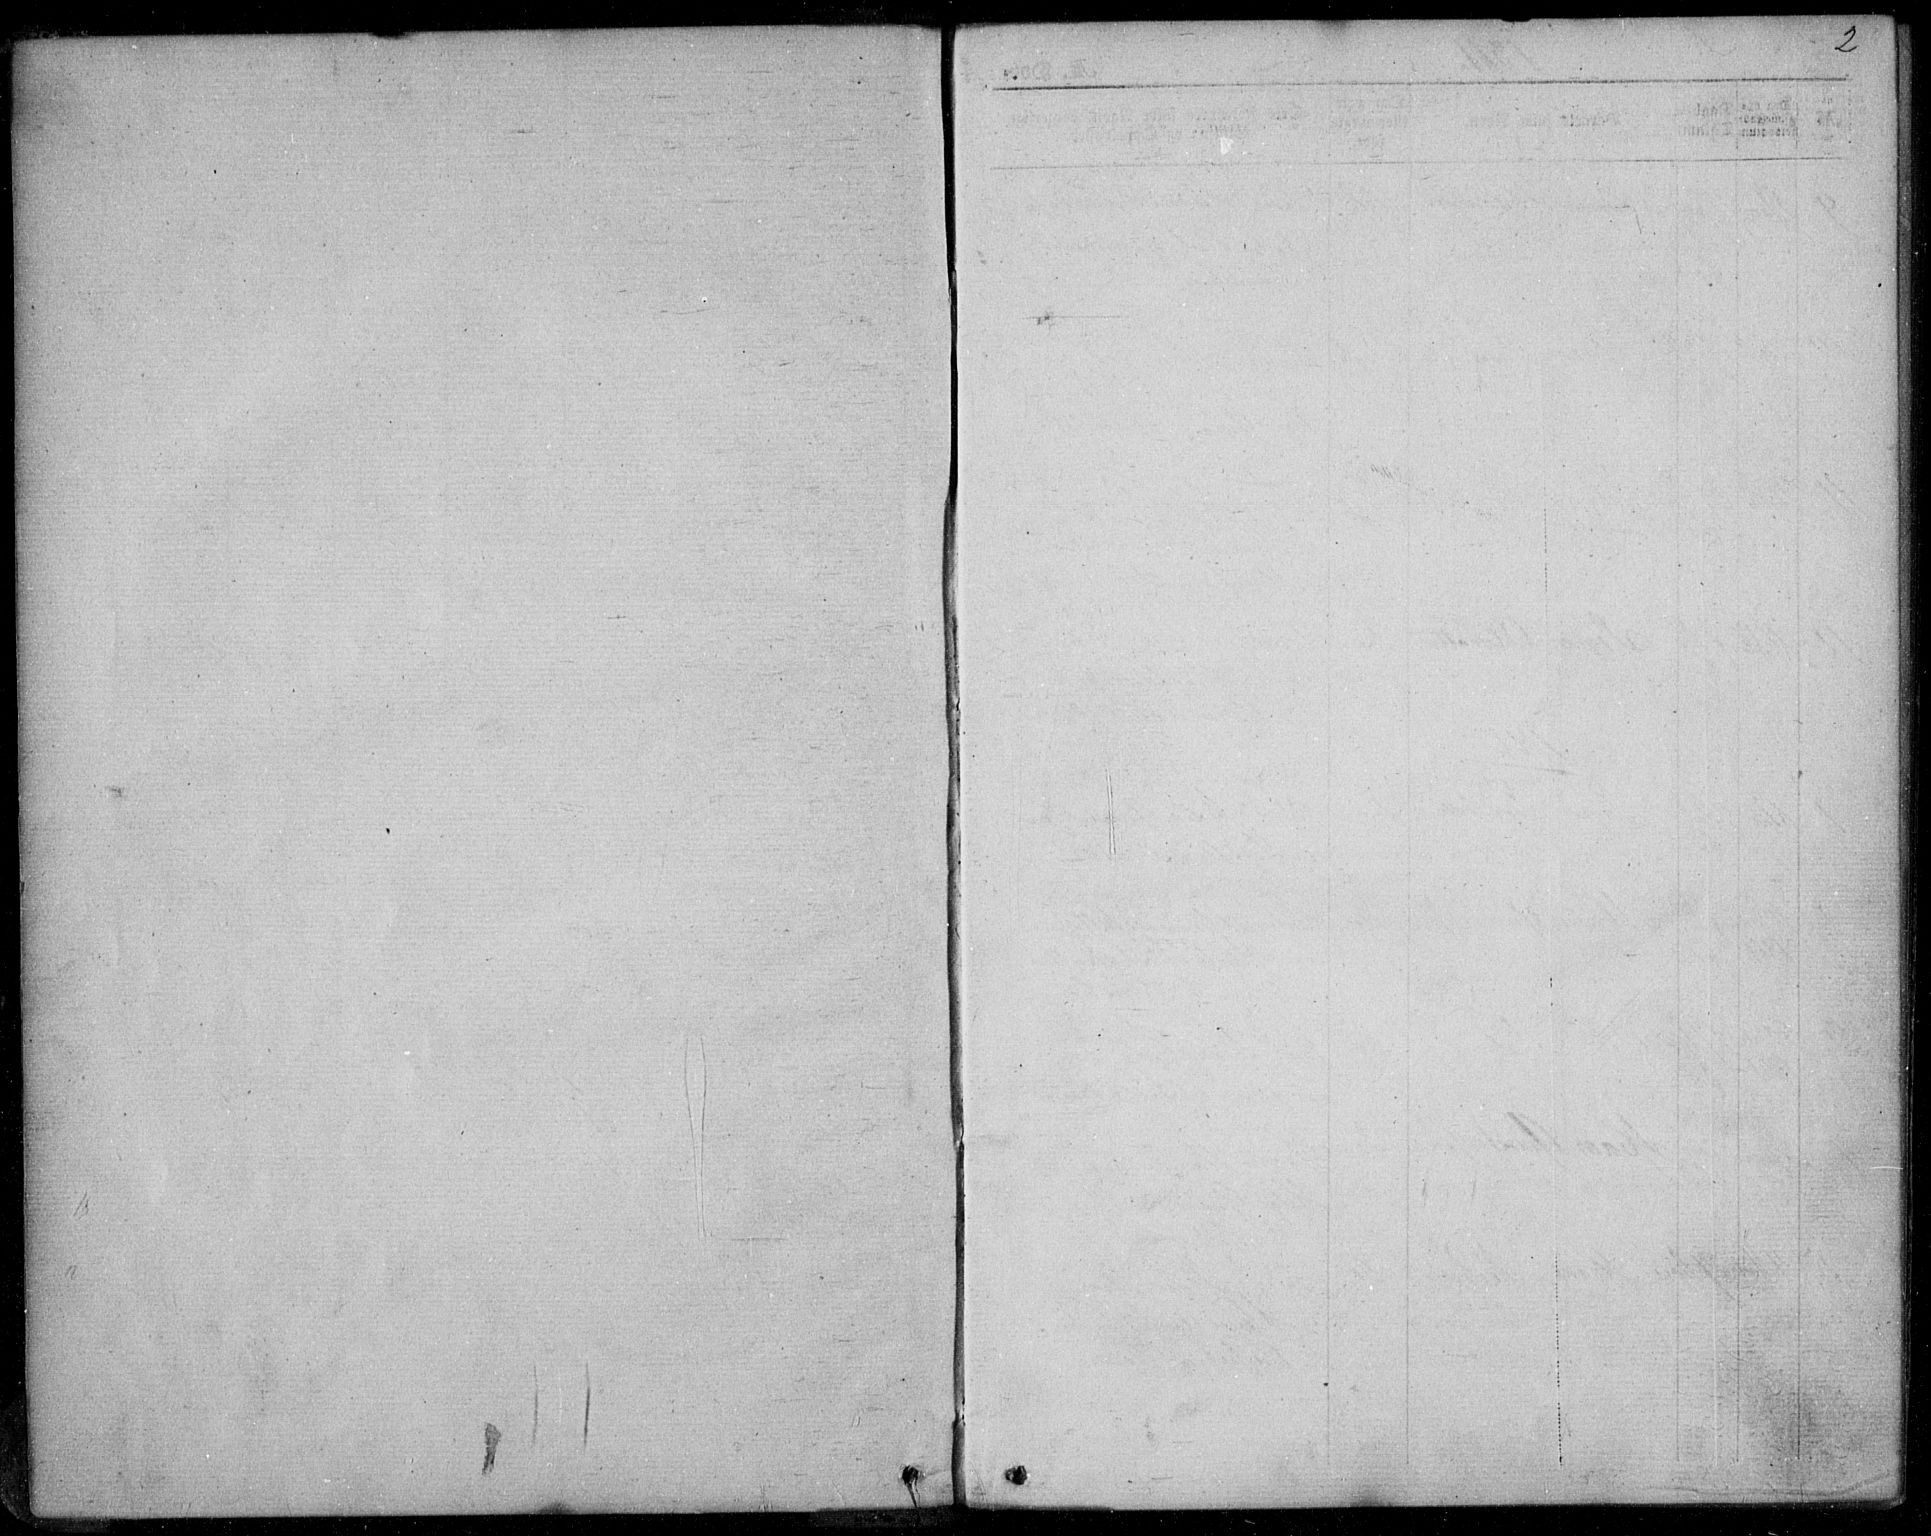 SAKO, Lunde kirkebøker, F/Fb/L0002: Ministerialbok nr. II 2, 1861-1881, s. 2